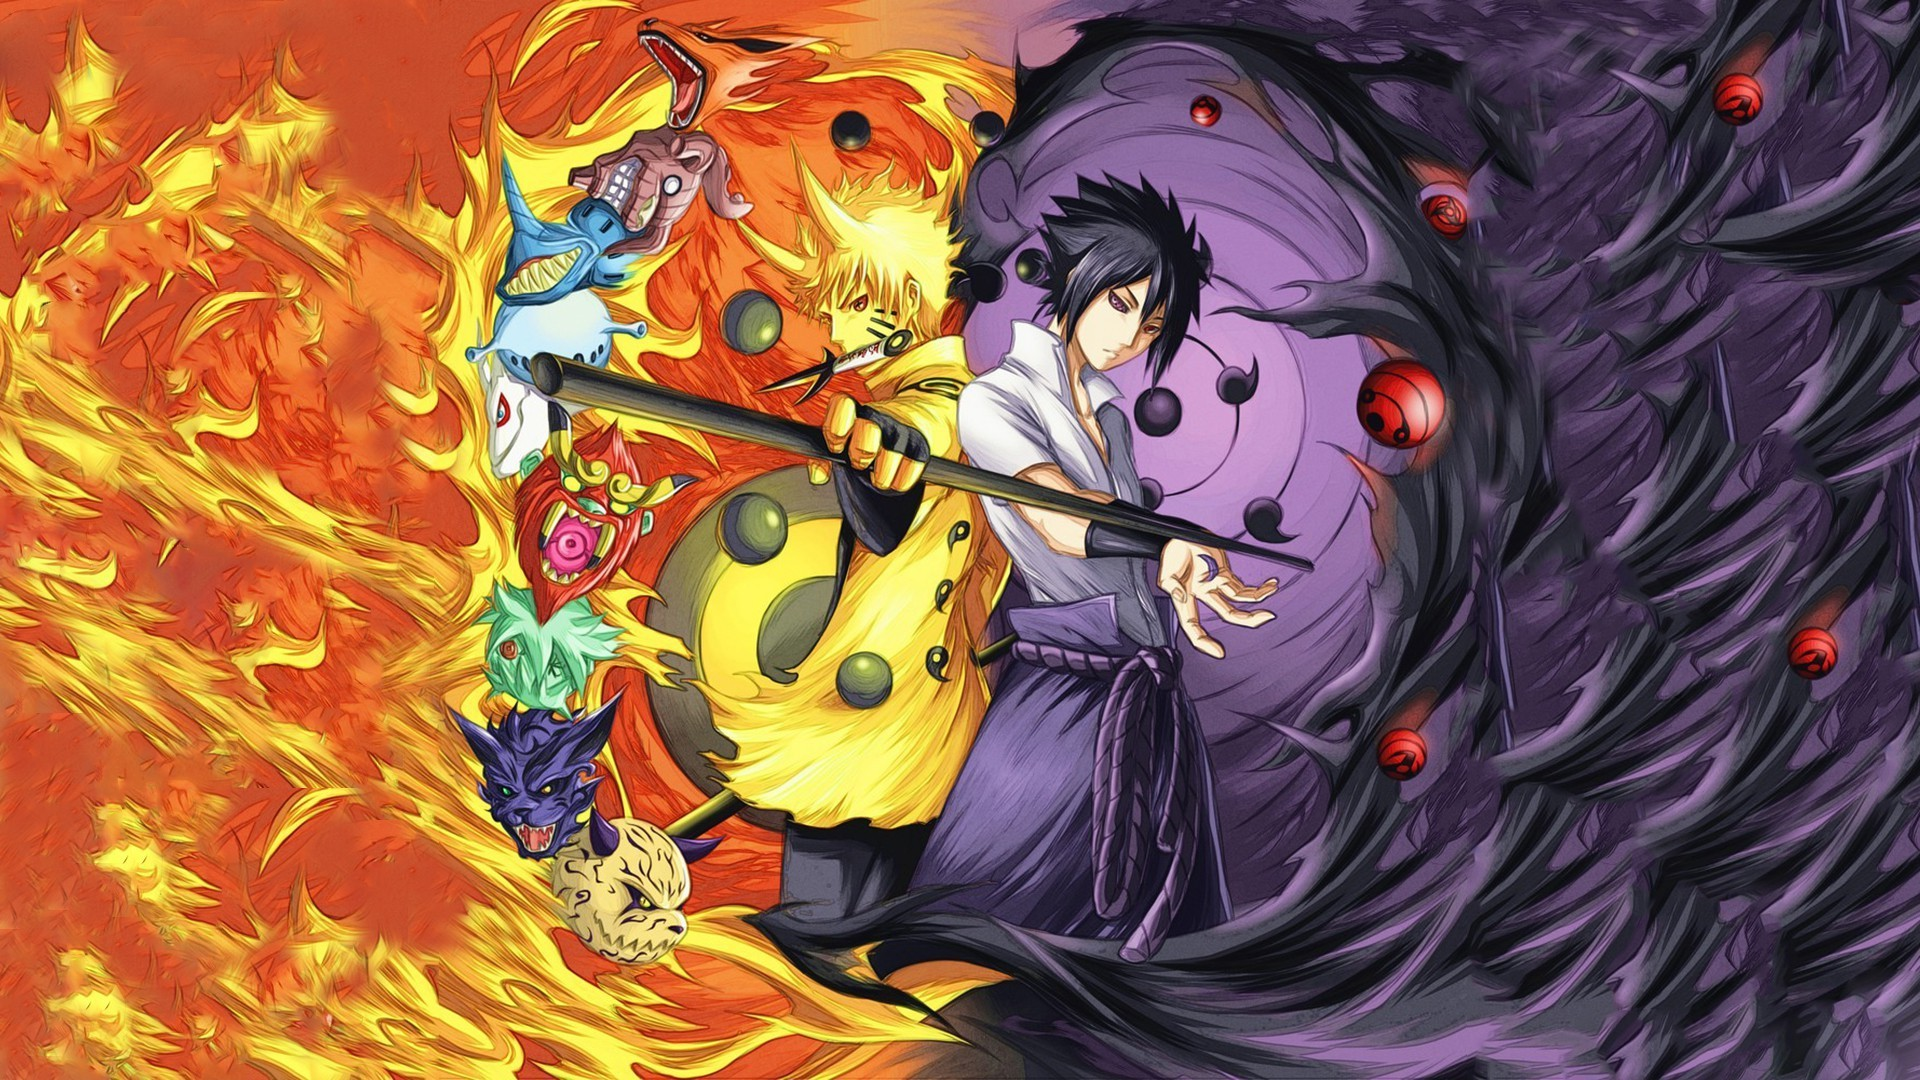 Rinnegan, Naruto Shippuuden, Uchiha Sasuke, Uzumaki Naruto, Anime Boys,  Manga, Sharingan, Fire, Bijuu Wallpapers HD / Desktop and Mobile Backgrounds